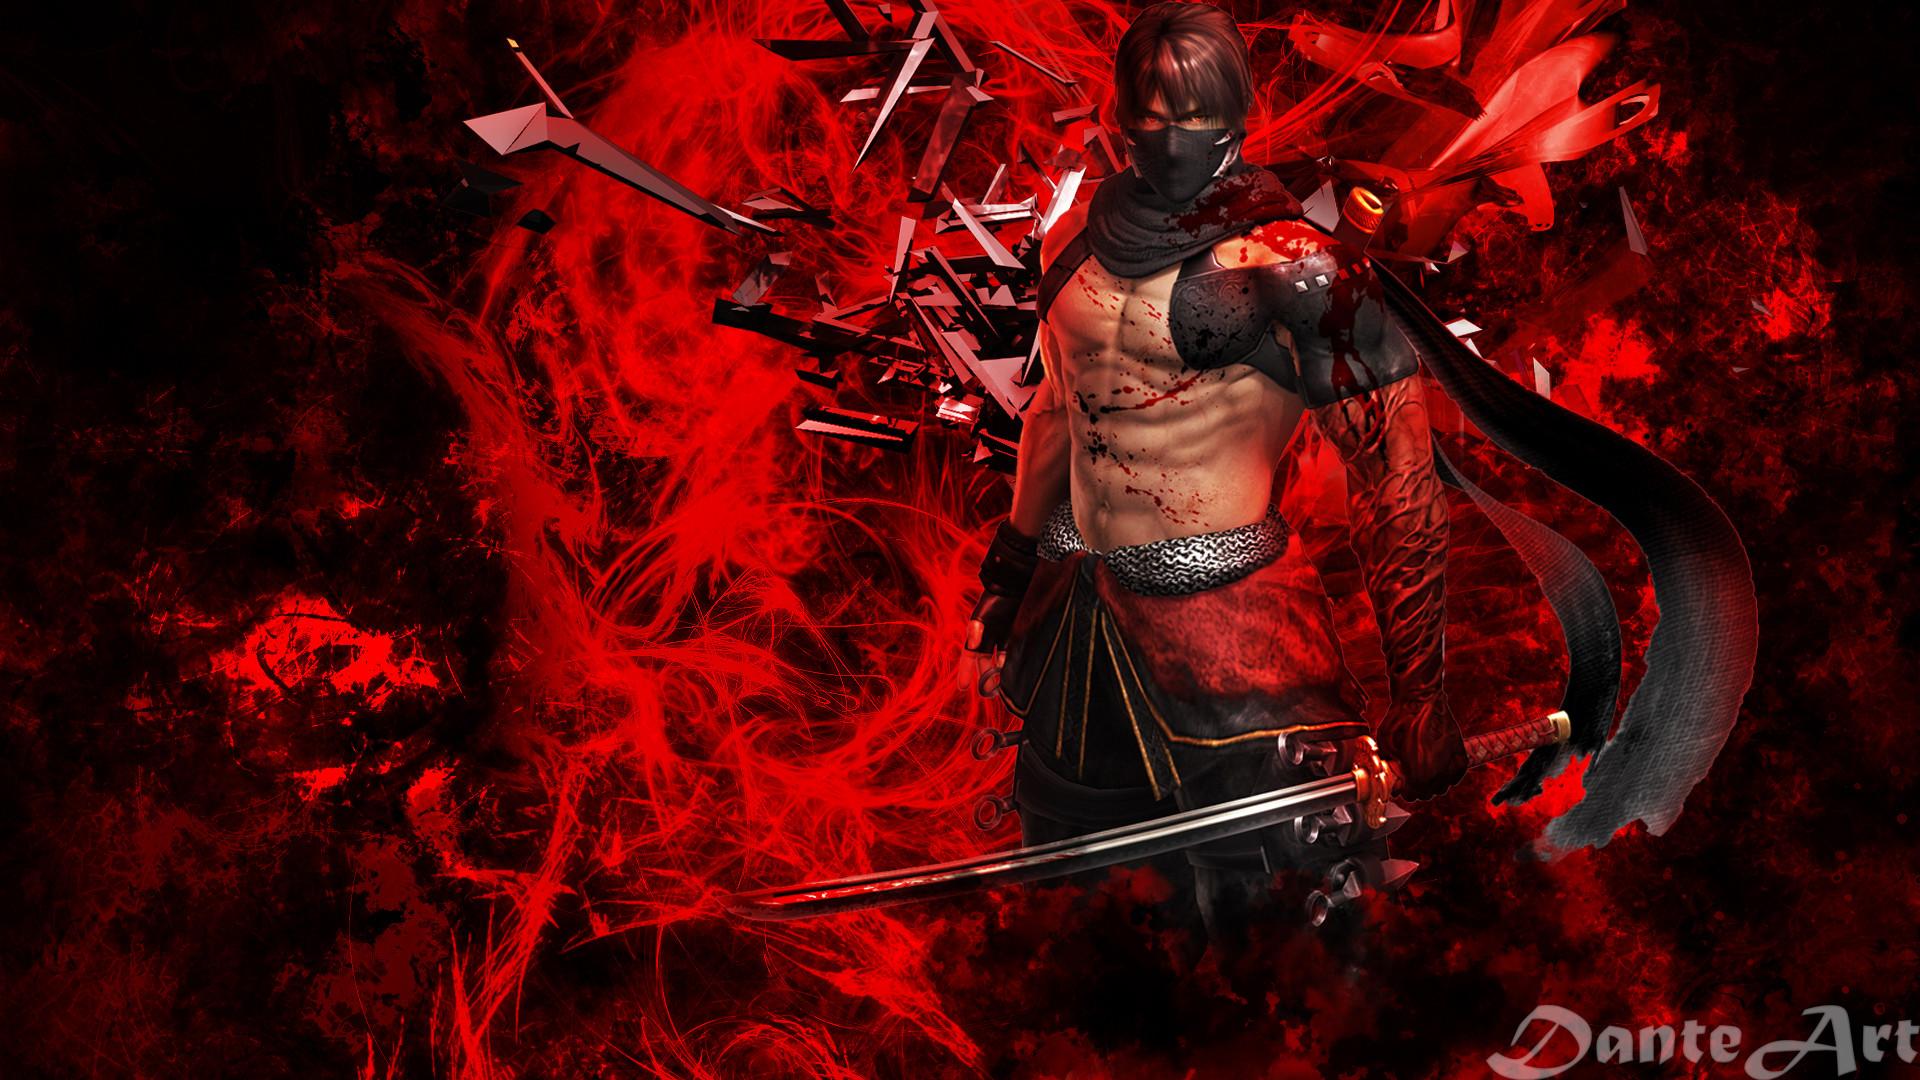 Ninja gaiden wallpaper hd 70 images - Ninja anime wallpaper ...